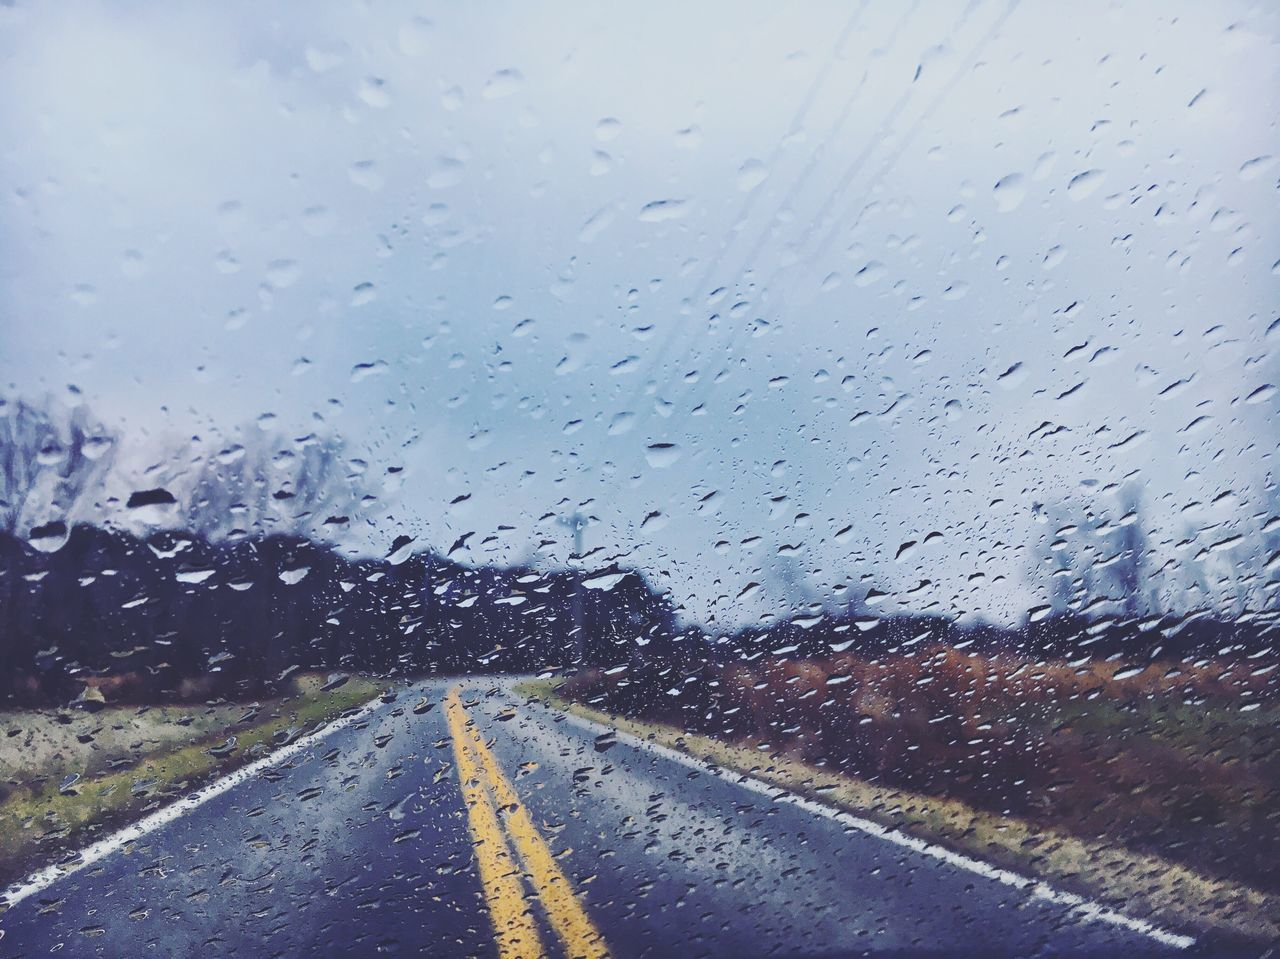 Rainy day Transportation Glass - Material Transparent Road Wet The Way Forward Car Drop Rain Vehicle Interior Window No People Windshield Land Vehicle Sky Car Interior Nature Day Mode Of Transport RainDrop Rain Drops Rainy Days Rainy Day Rainy Rainy Season